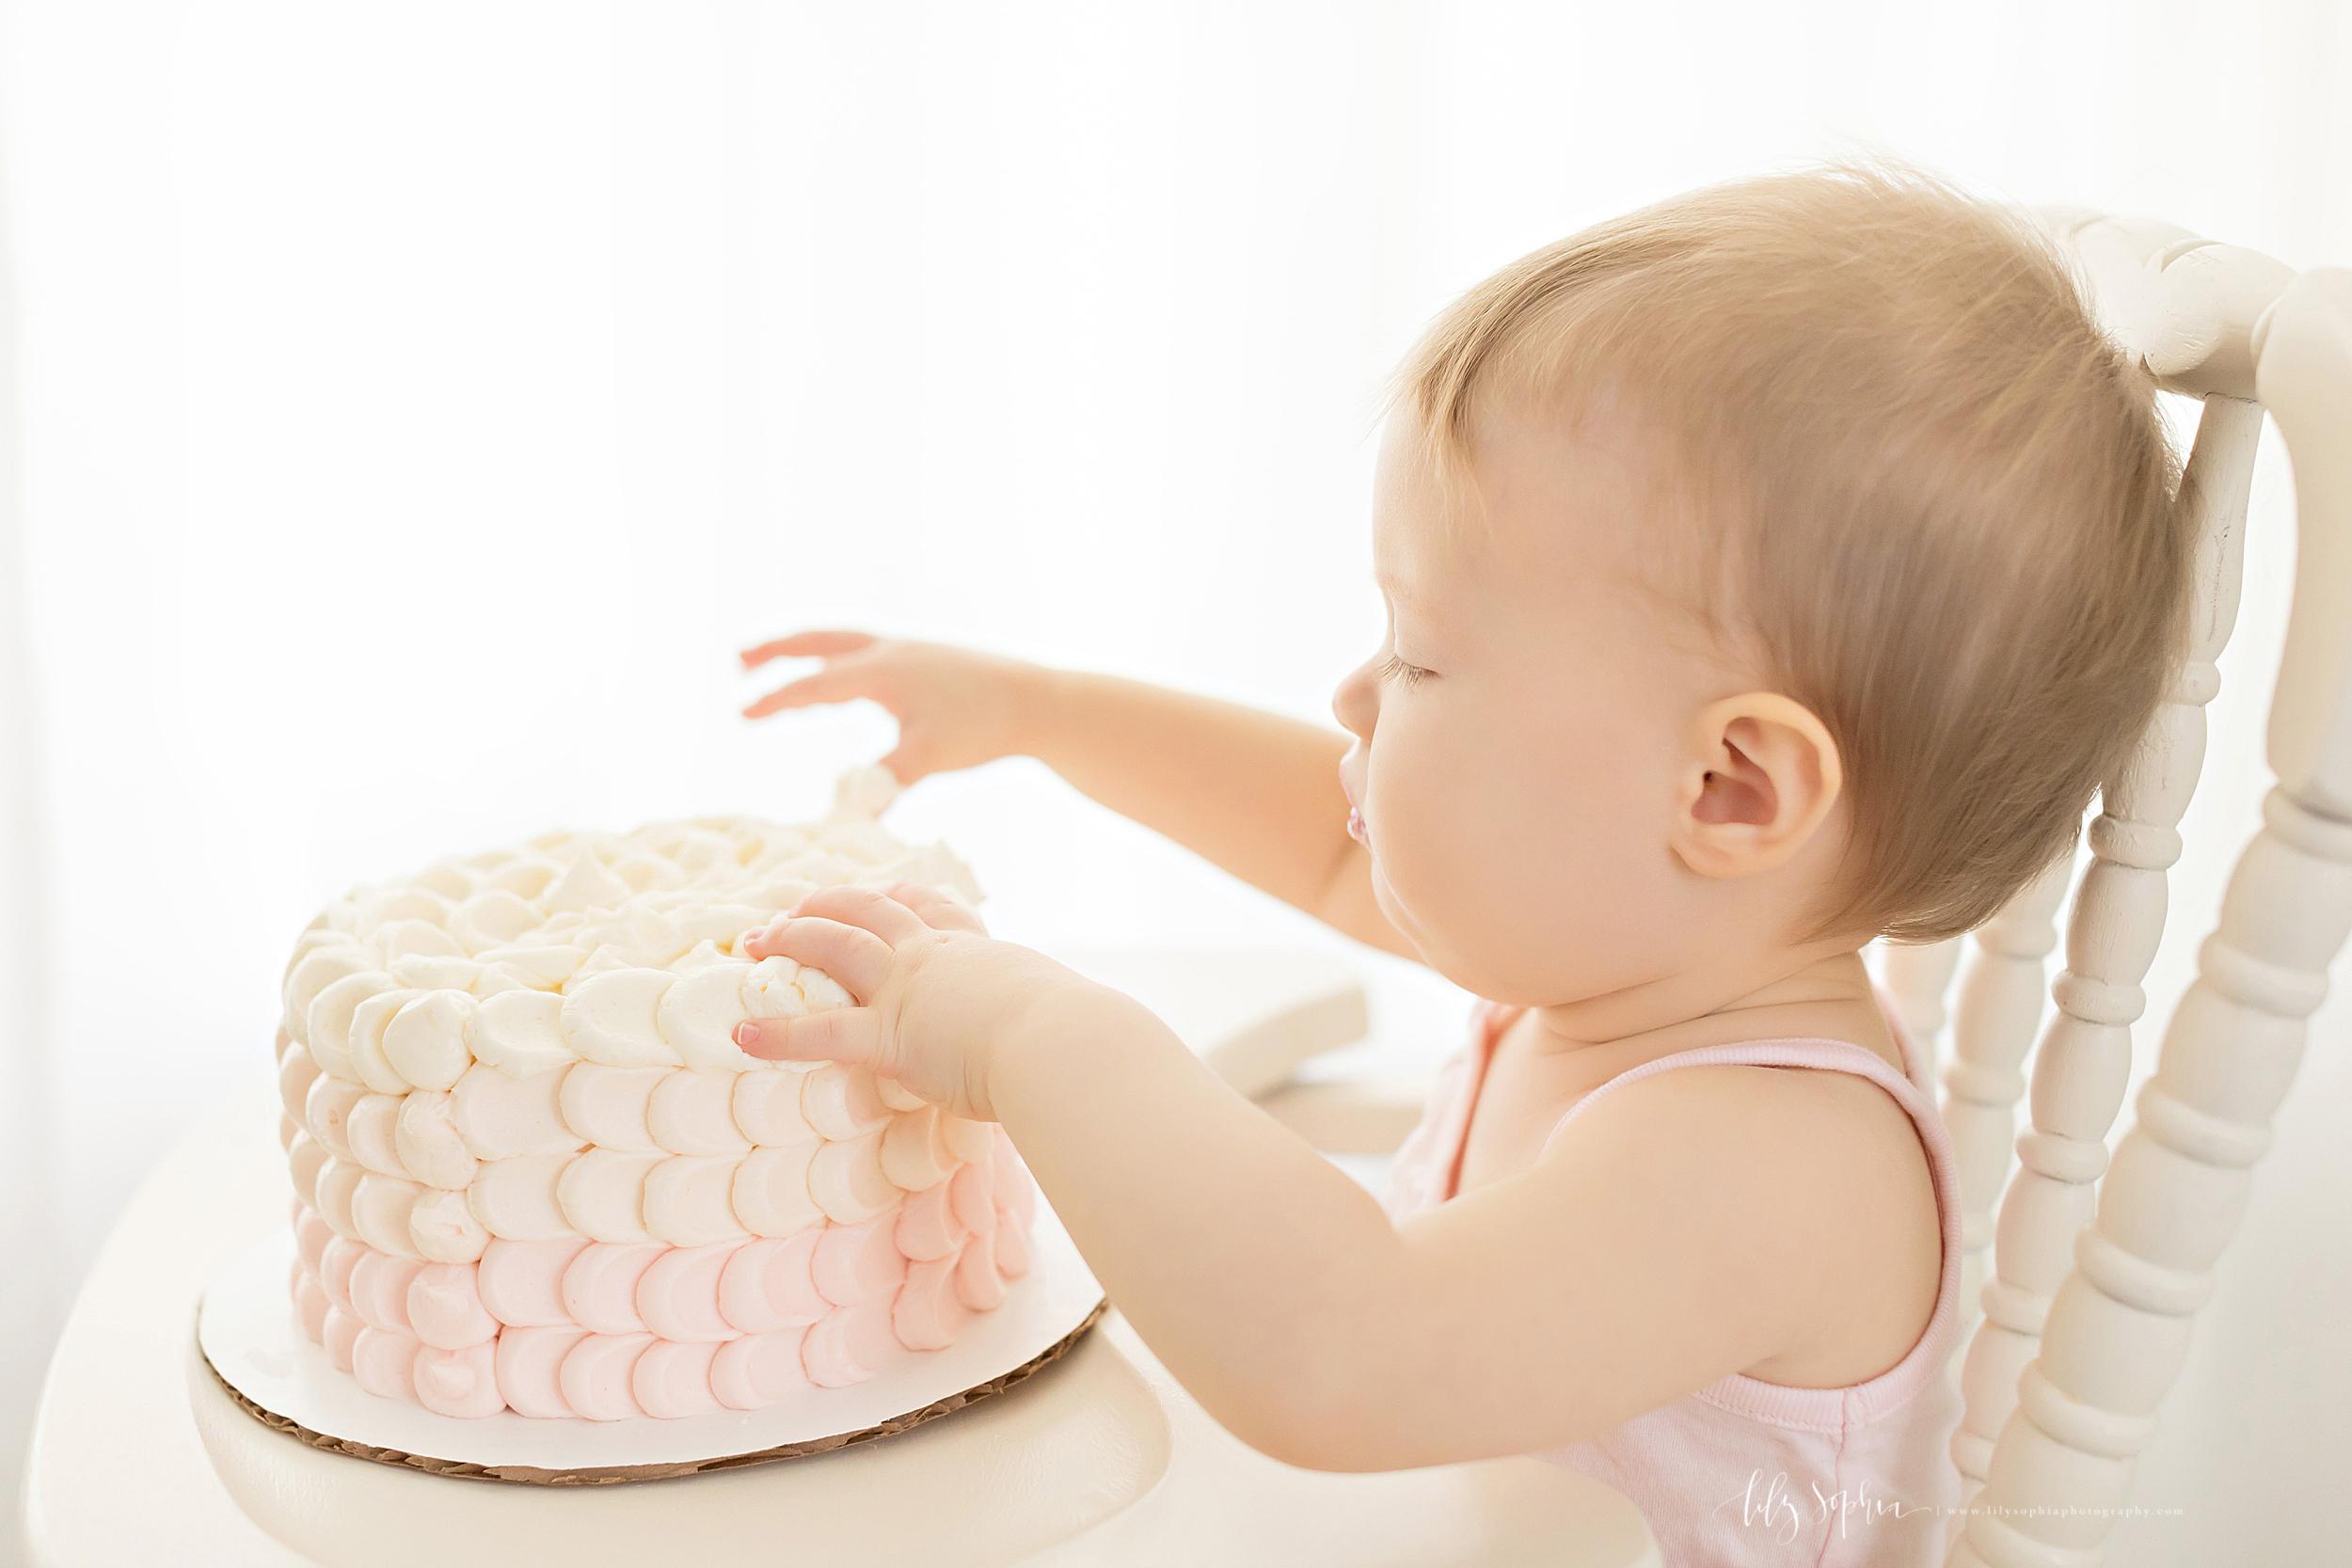 atlanta-midtown-sandy-springs-decatur-lily-sophia-photography-photographer-first-birthday-cake-smash-baby-girl_0211.jpg